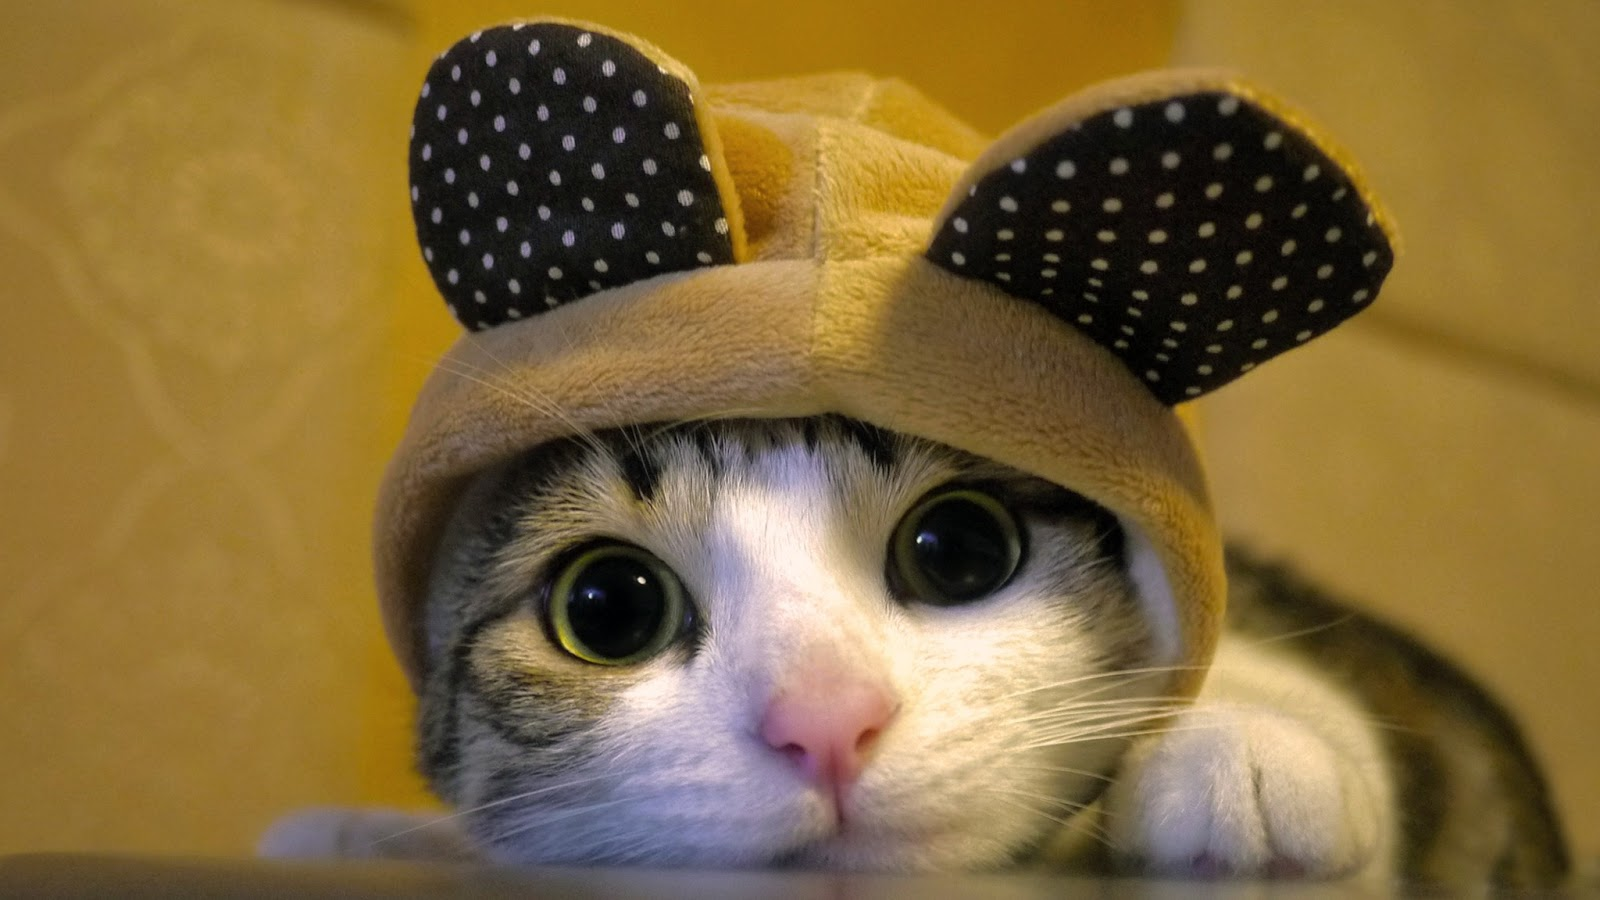 Kitapl k faresi may s 2013 - Cute kittens hd images ...